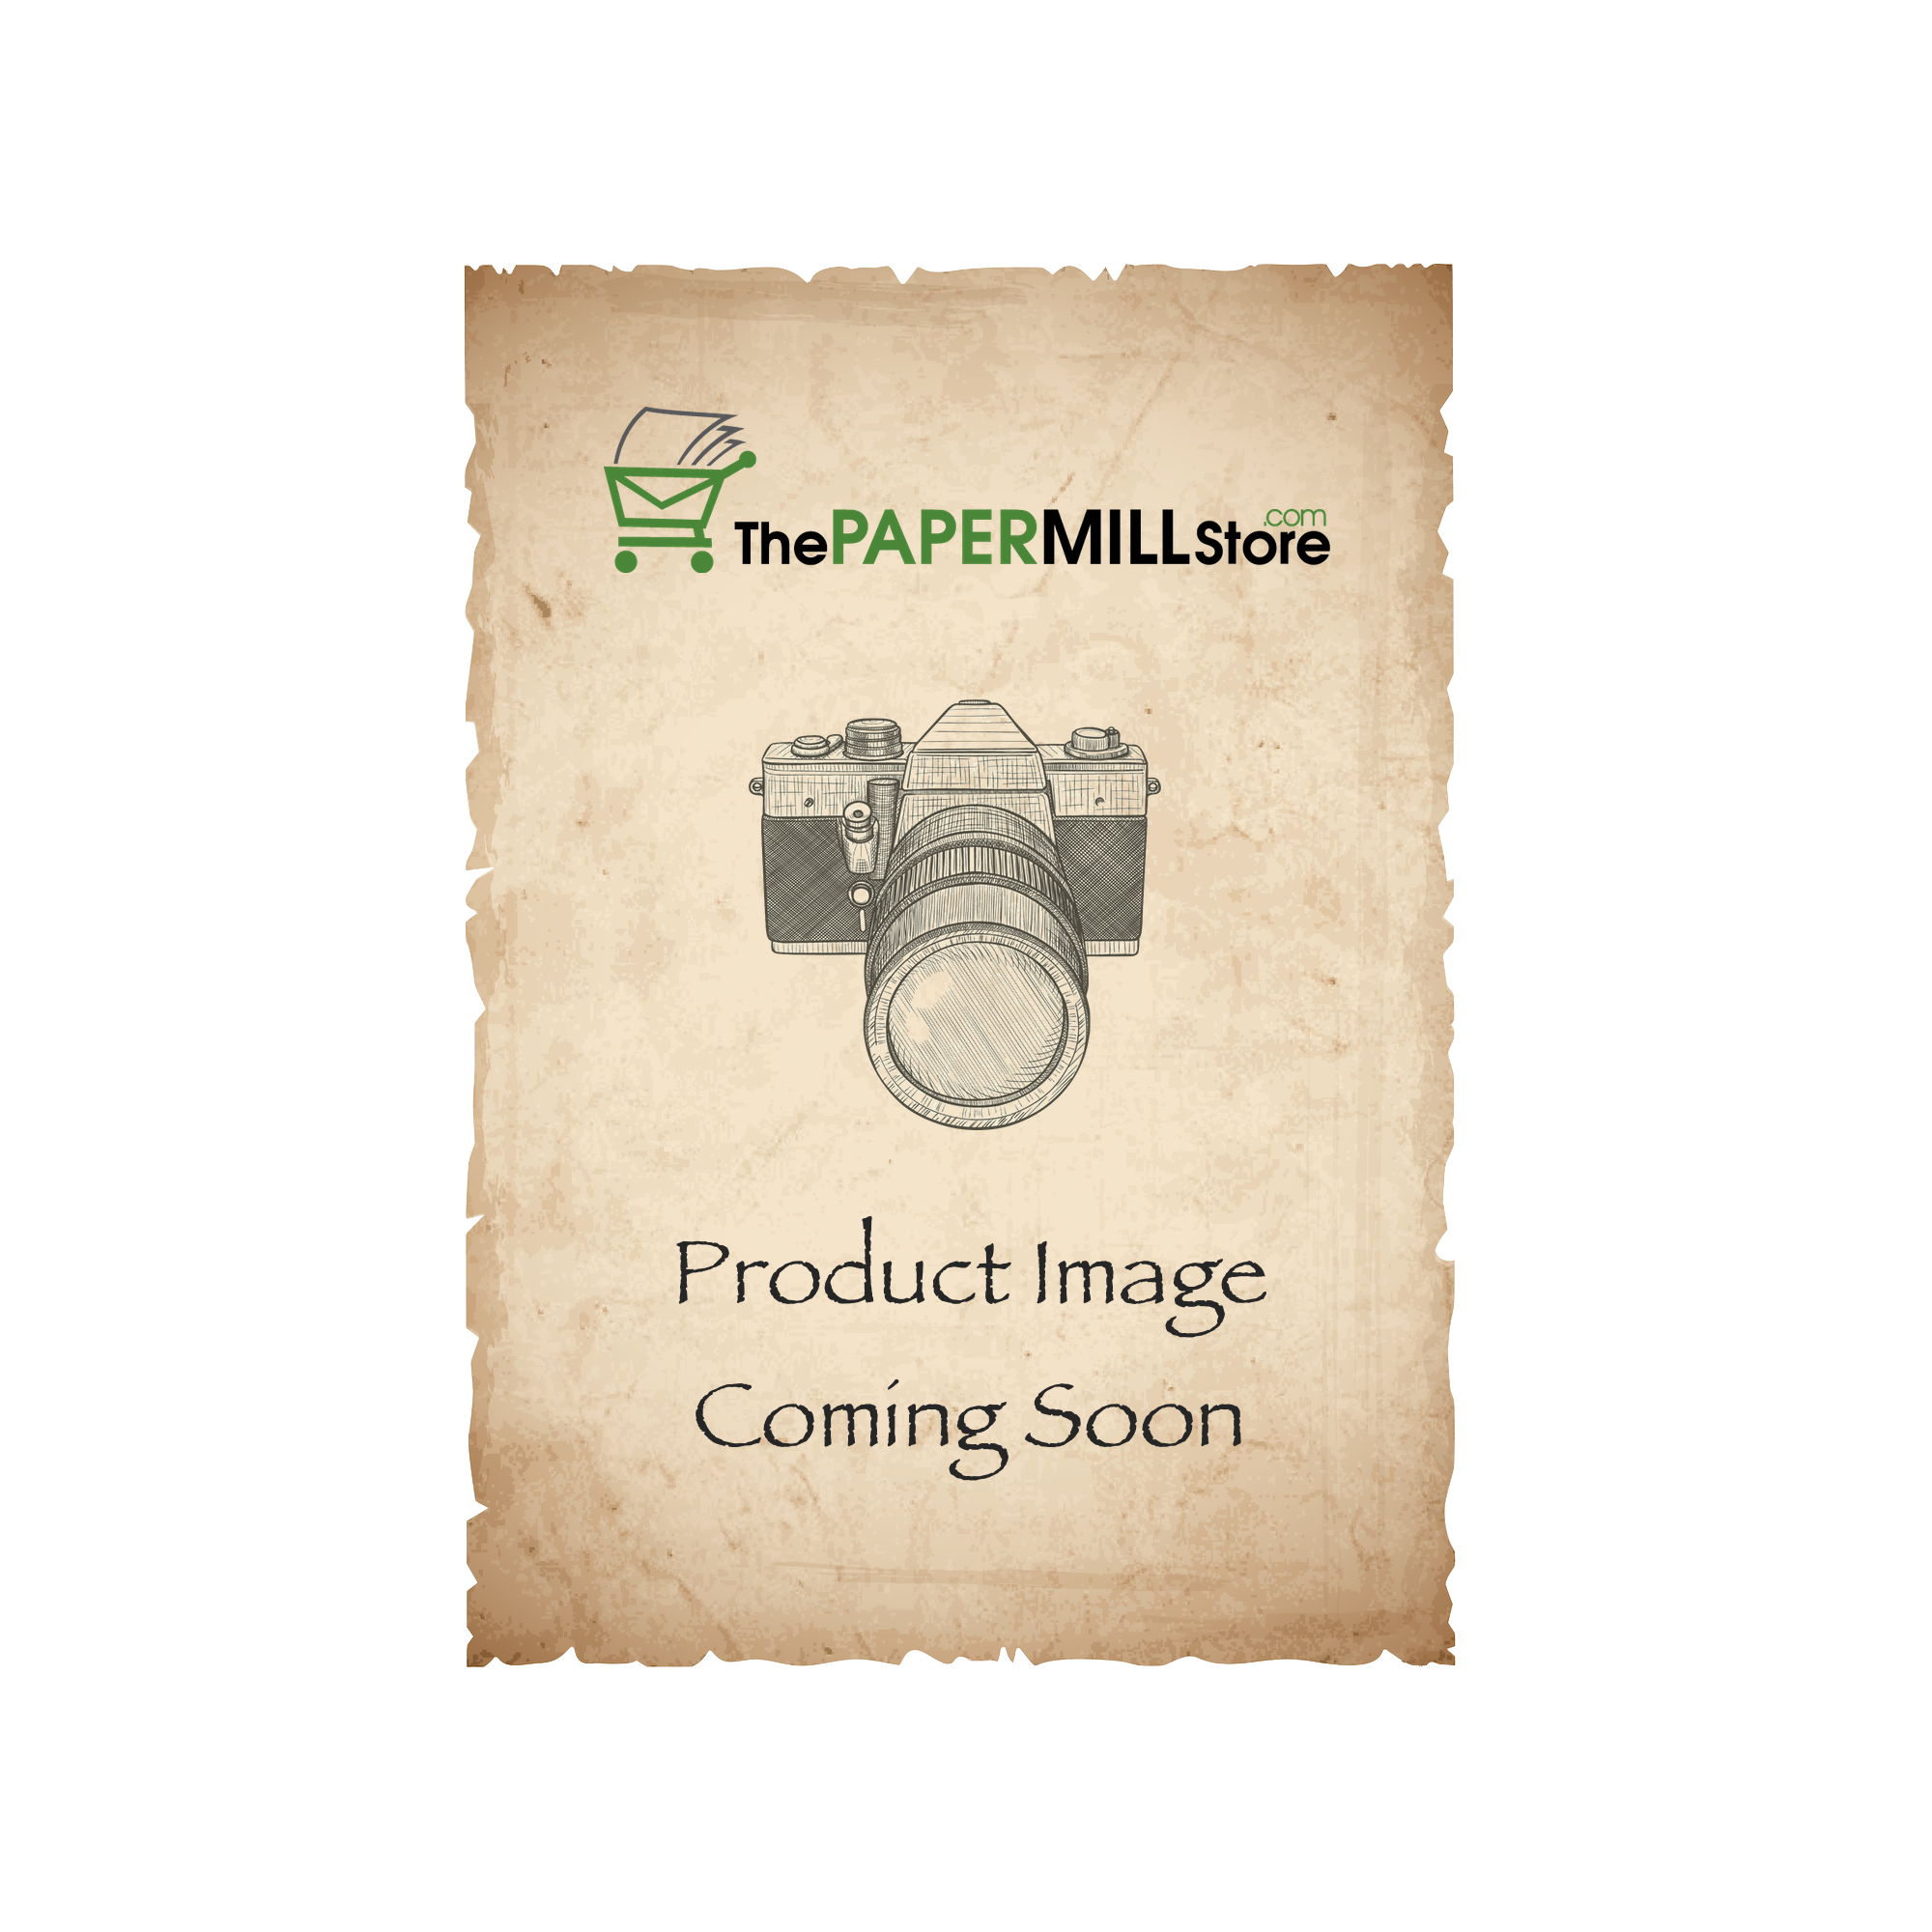 Astrobrights Fireball Fuchsia Envelopes - A2 (4 3/8 x 5 3/4) 60 lb Text Smooth 250 per Box